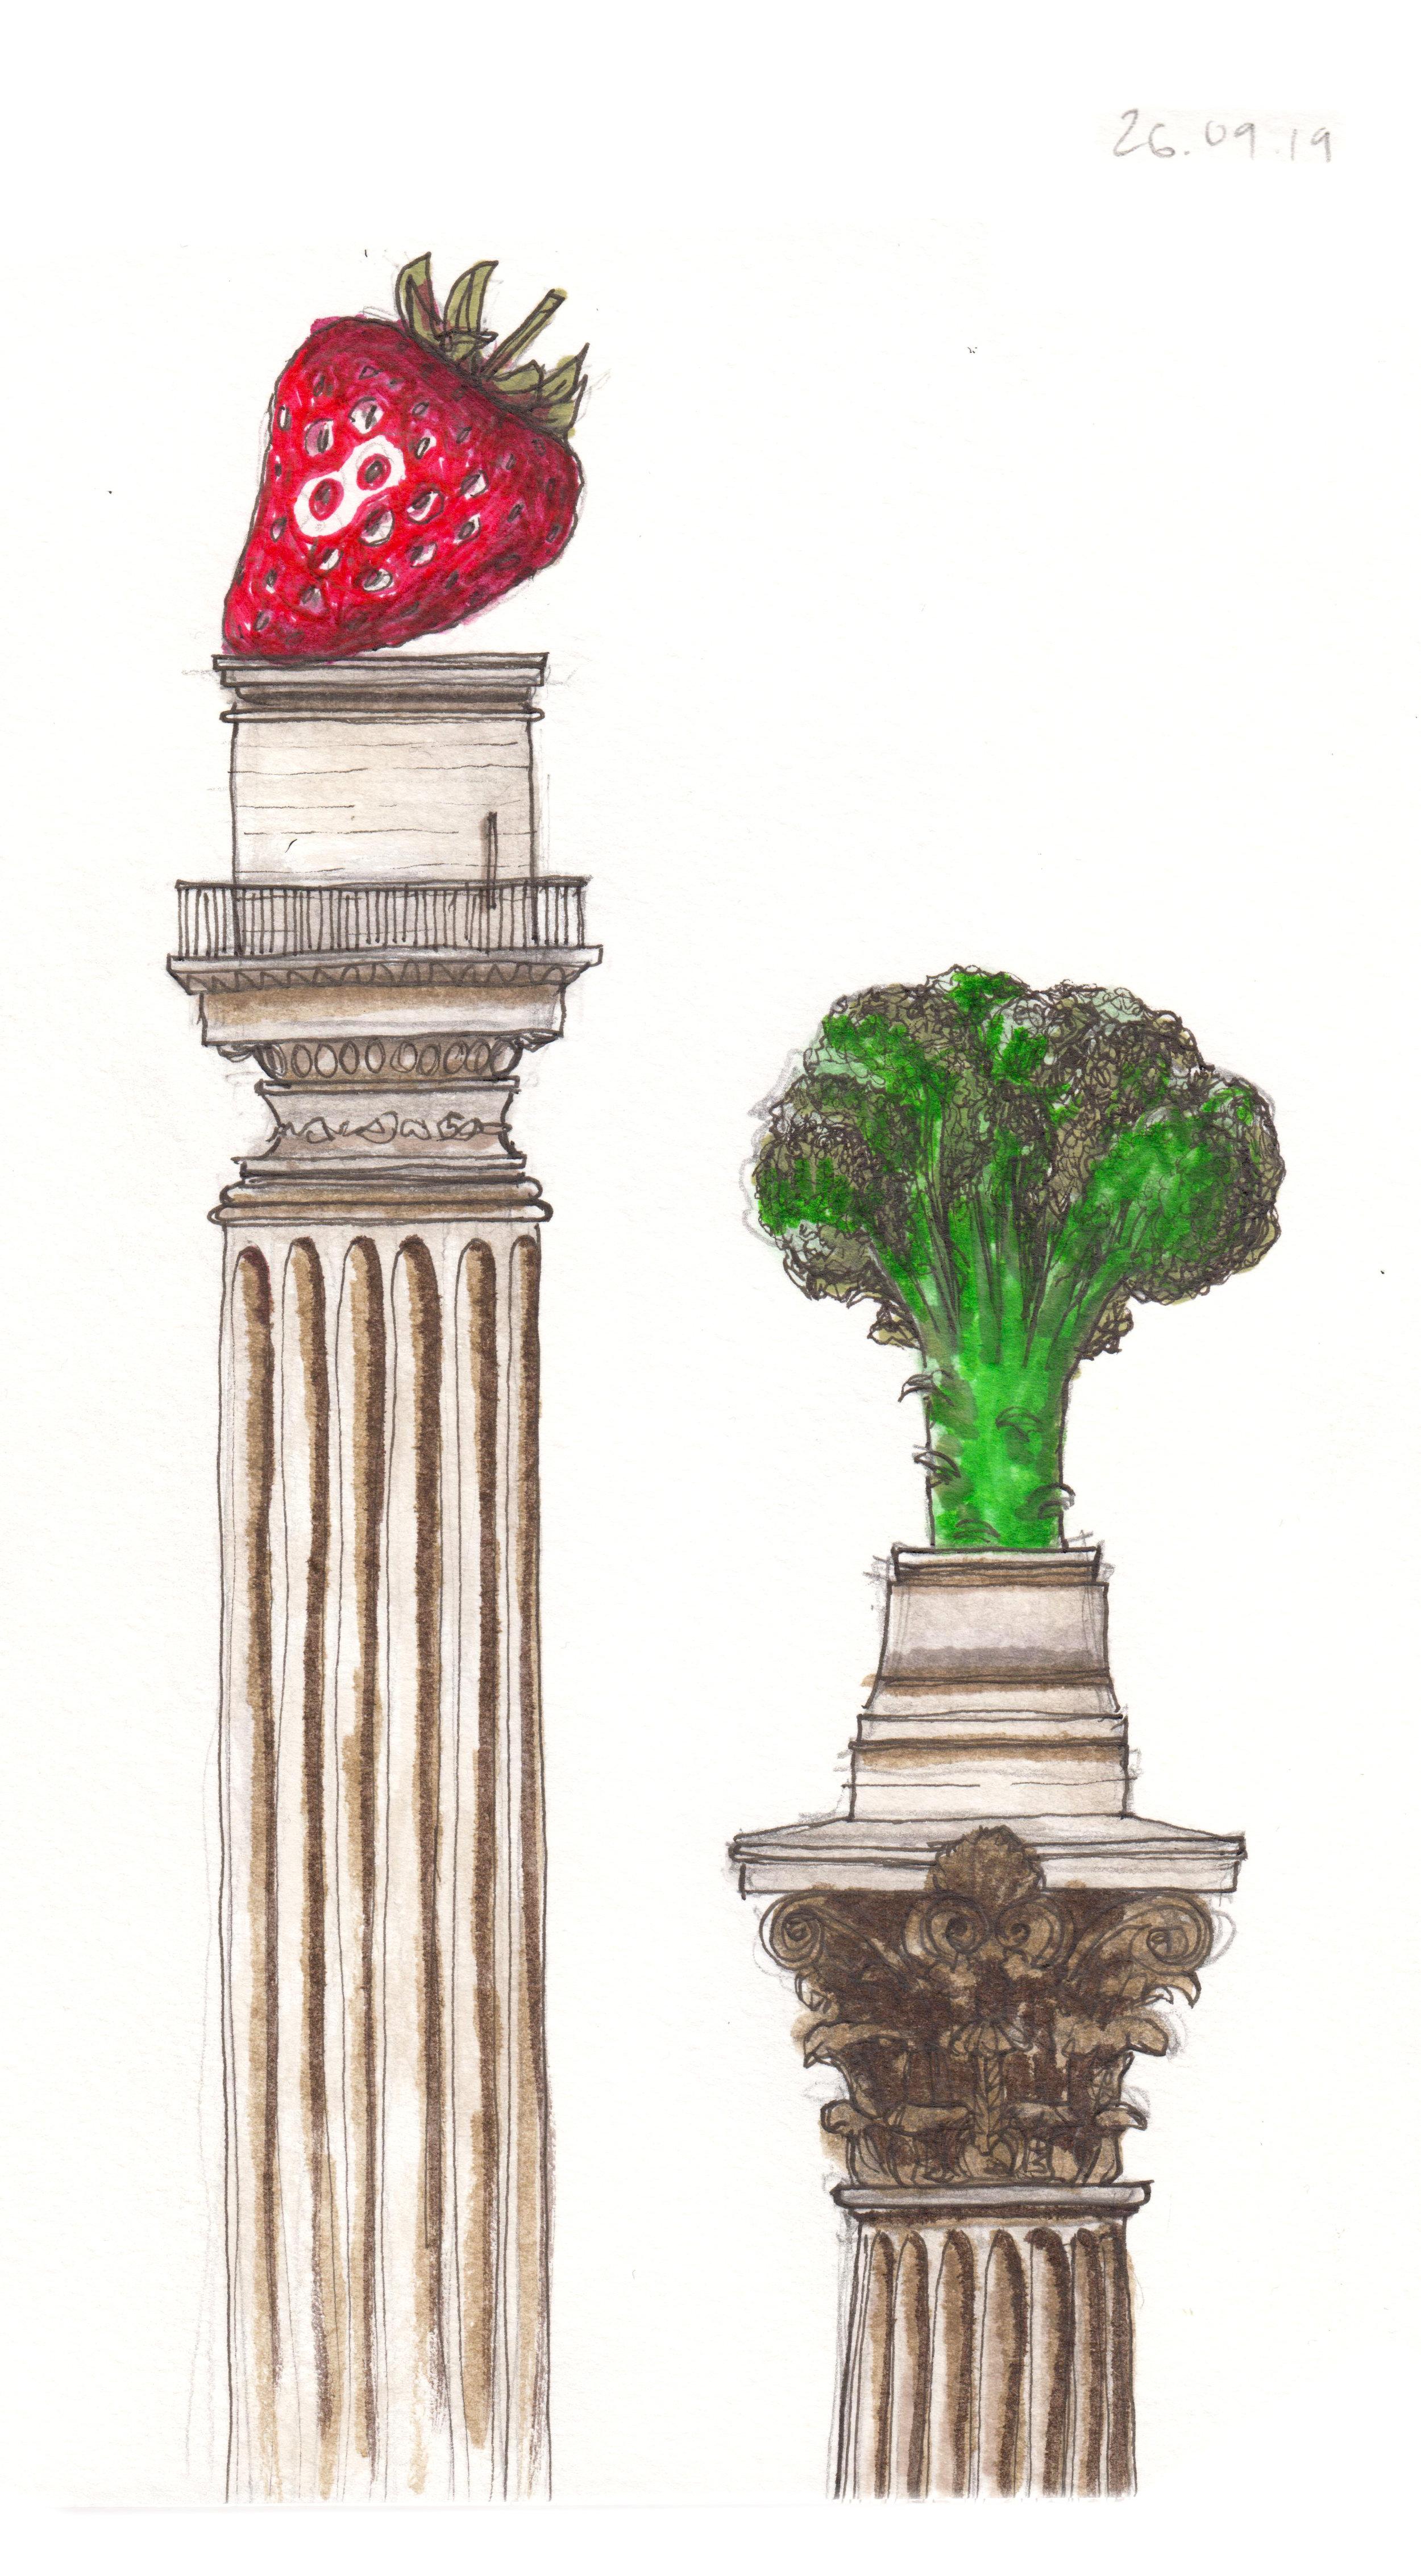 26.09.19 ... Nelson's strawberry & Monument broccoli